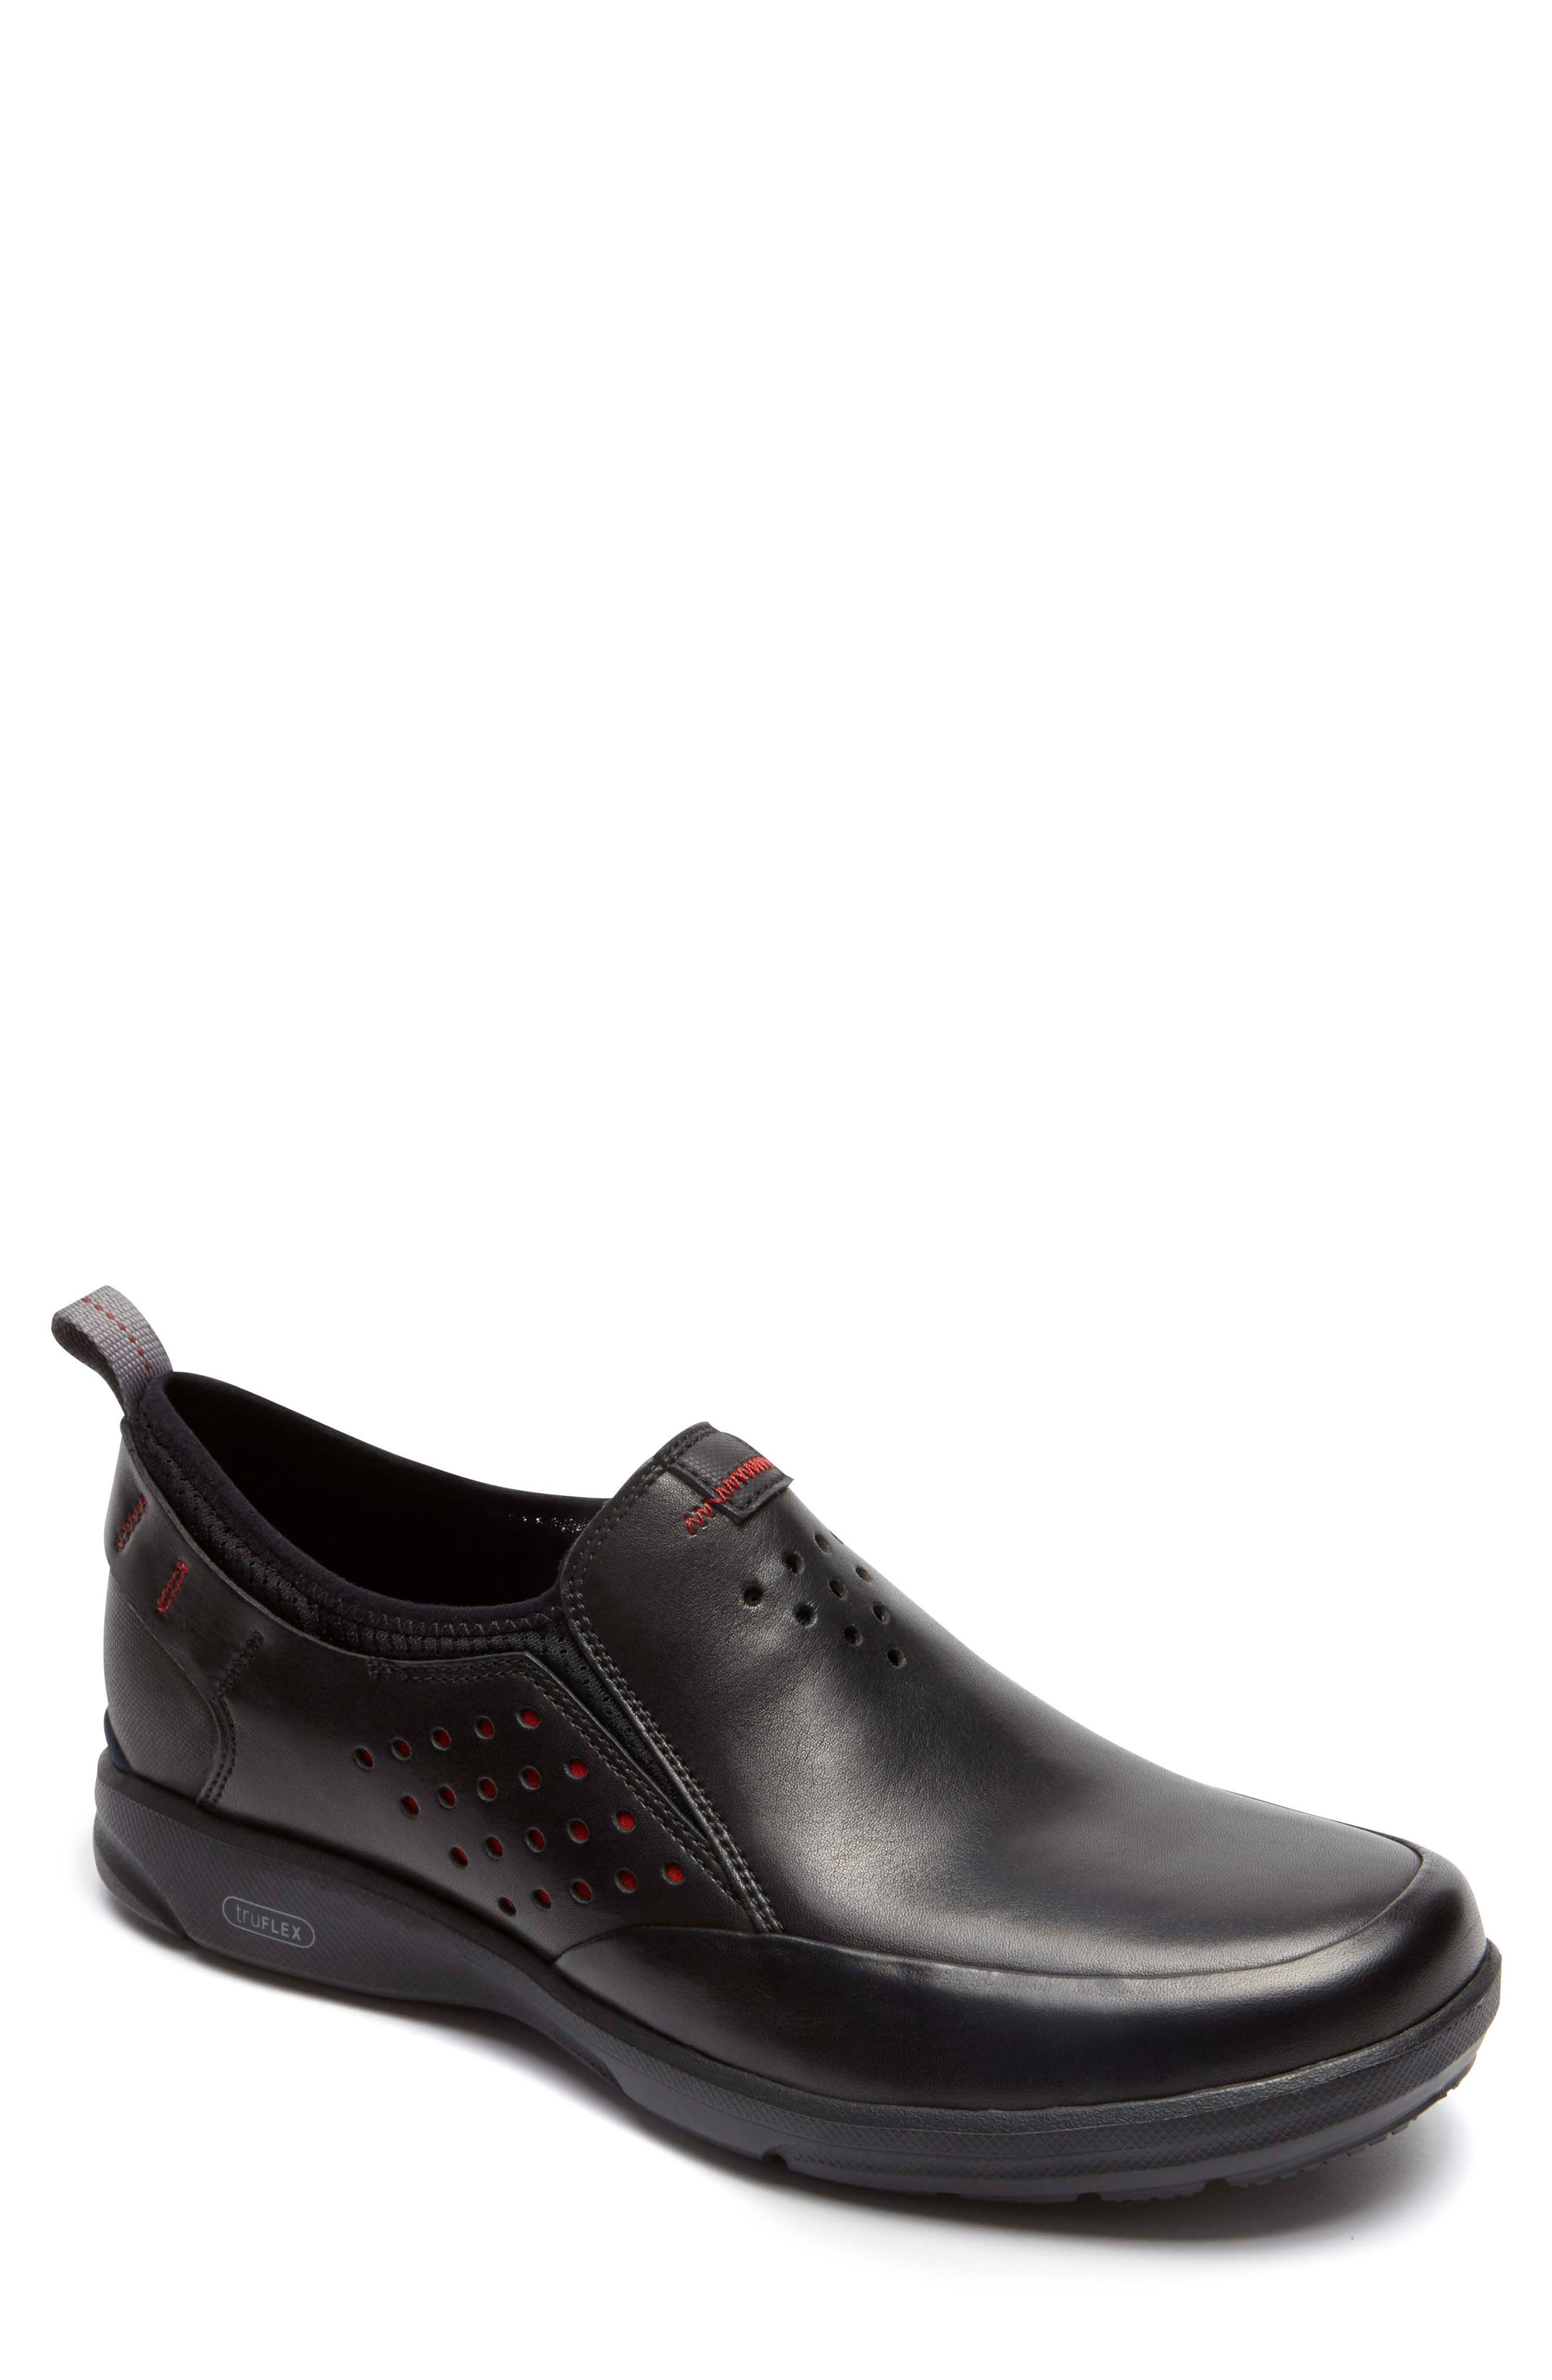 Truflex Slip-On,                         Main,                         color, BLACK LEATHER